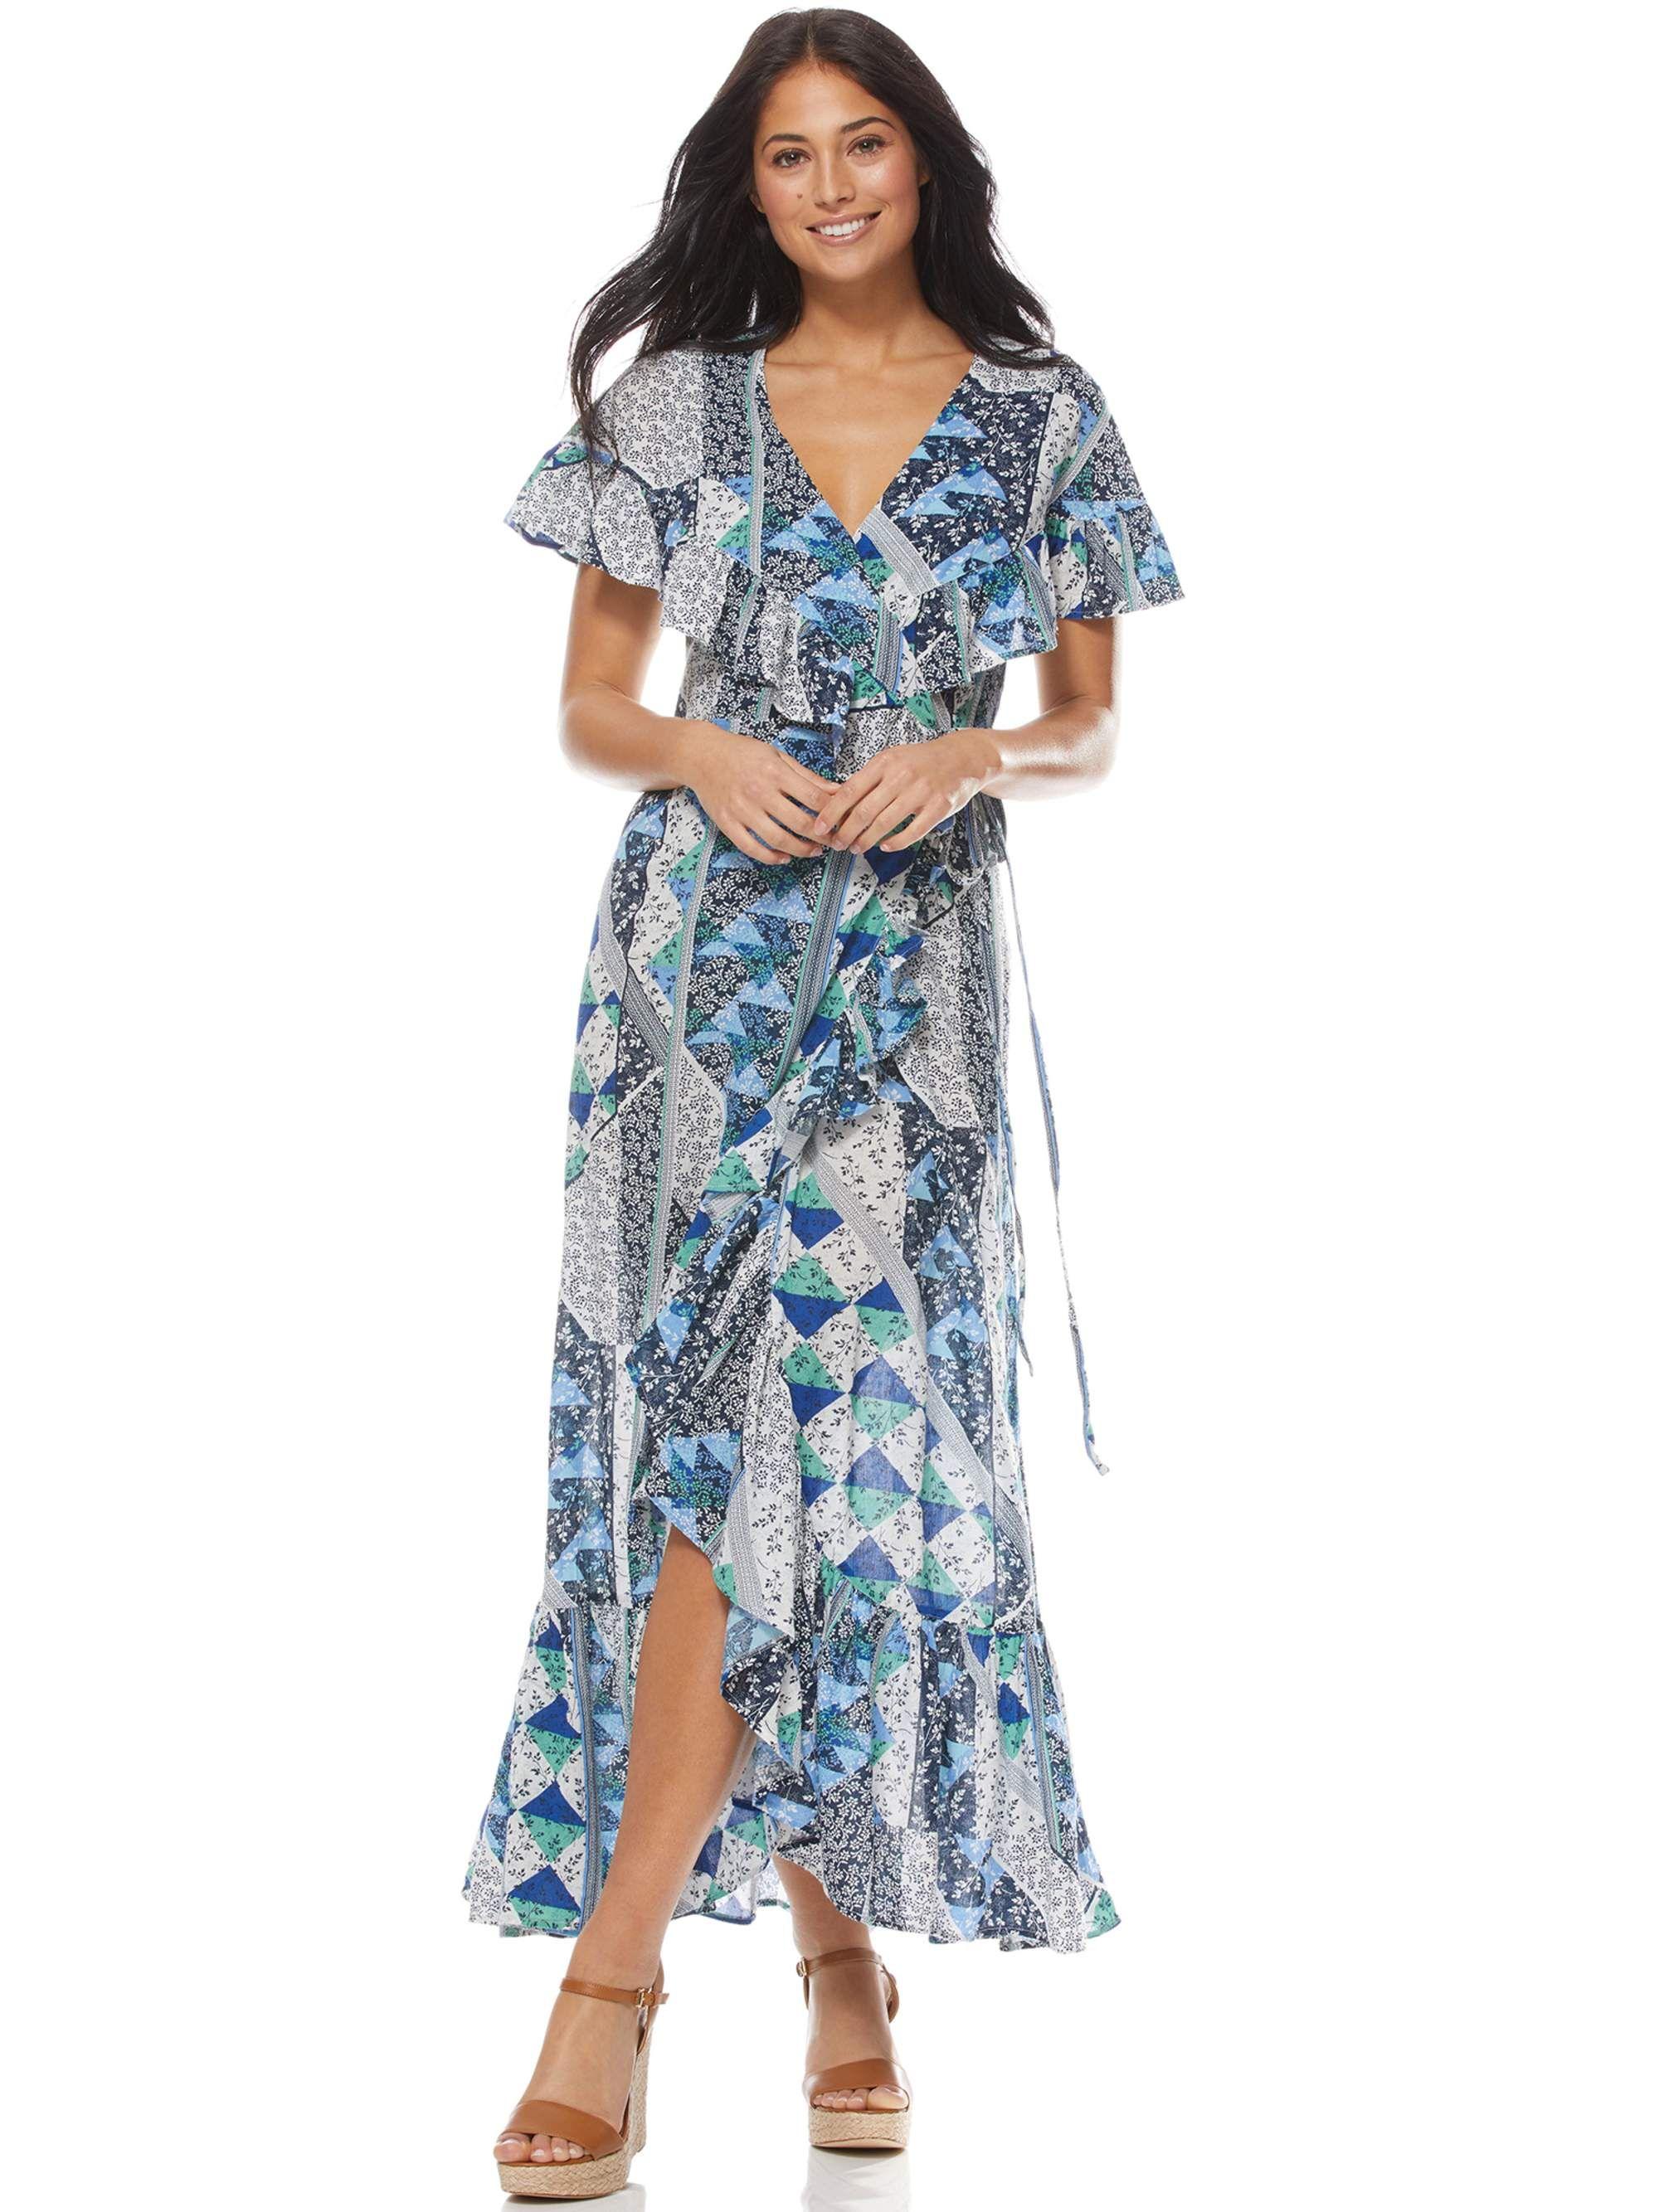 Free 2 Day Shipping Buy Sofia Jeans By Sofia Vergara Short Sleeve Wrap Maxi Dress Women S At Walmart Com In 2020 Maxi Dress Maxi Wrap Dress Clothes For Women [ 2667 x 2000 Pixel ]